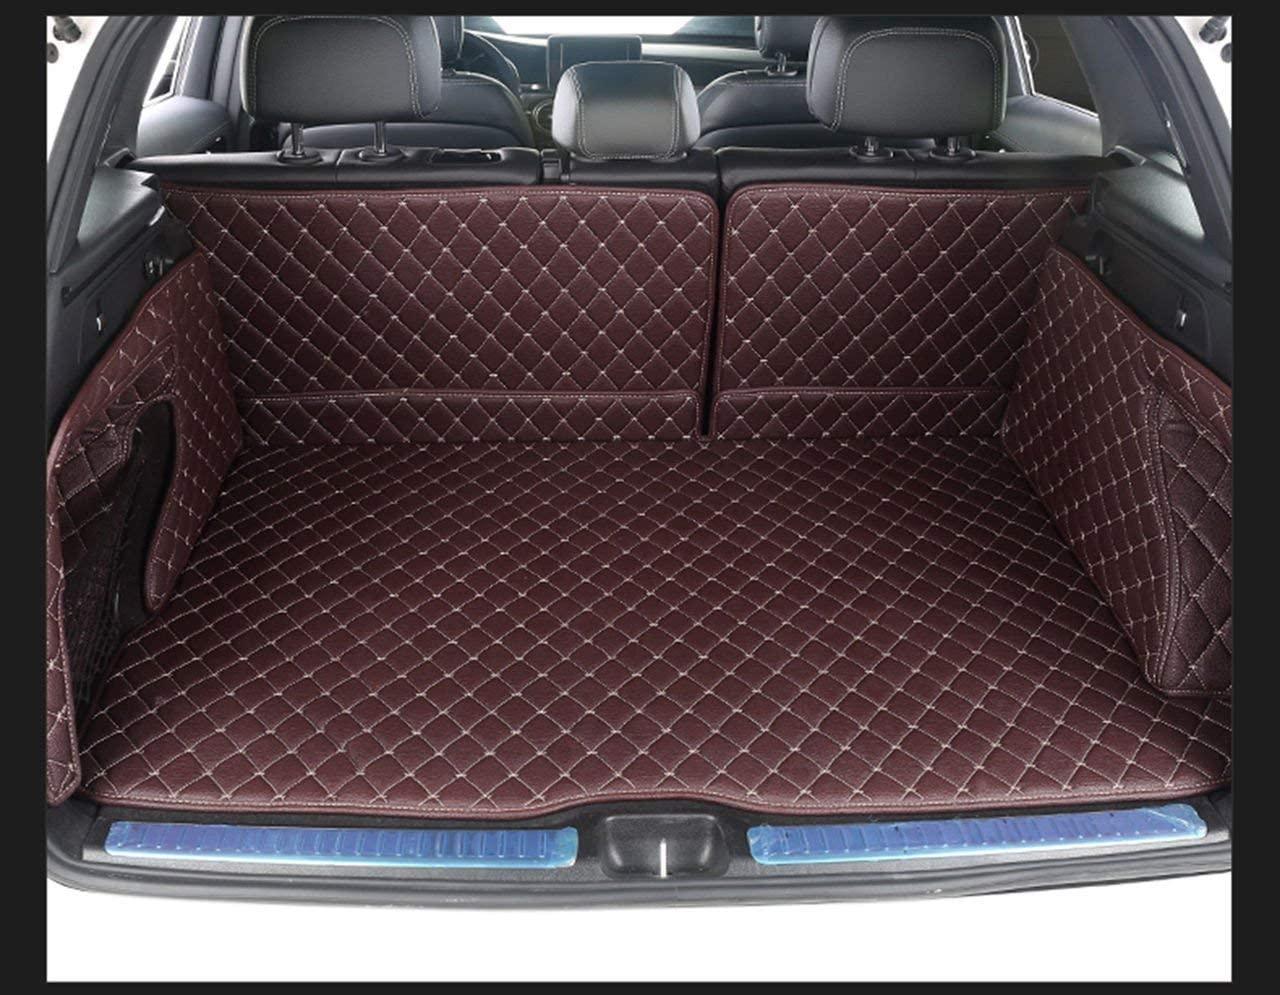 Bonus-Mats Custom Fit All-Weather Full Coverage Waterproof Car Cargo Liner Trunk Mat for Mercedes Benz G Class G550 G63 2019-2020 Coffee